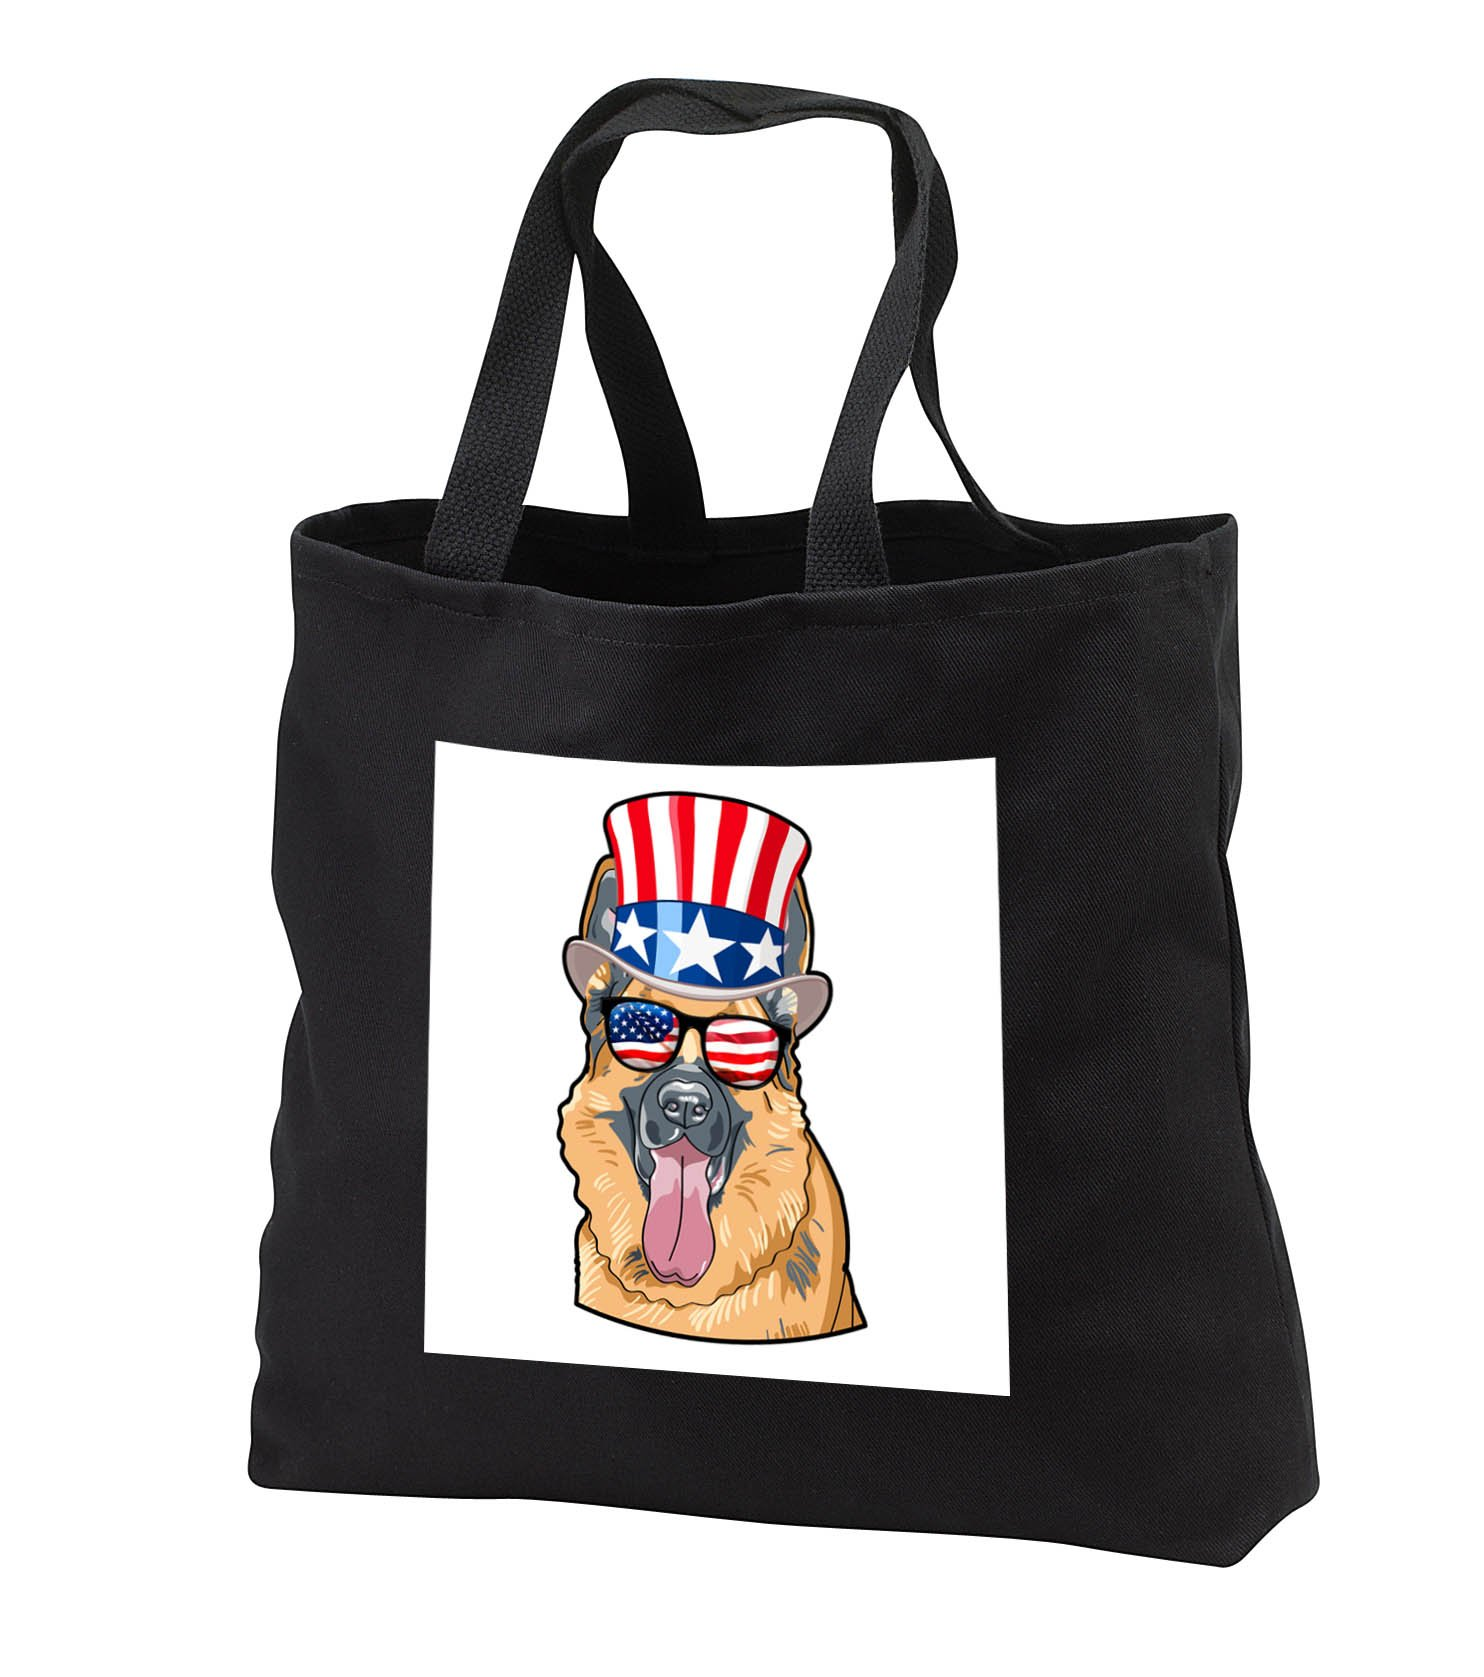 Patriotic American Dogs - German Shepherd Dog With American Flag Sunglasses and Top hat - Tote Bags - Black Tote Bag JUMBO 20w x 15h x 5d (tb_282708_3)